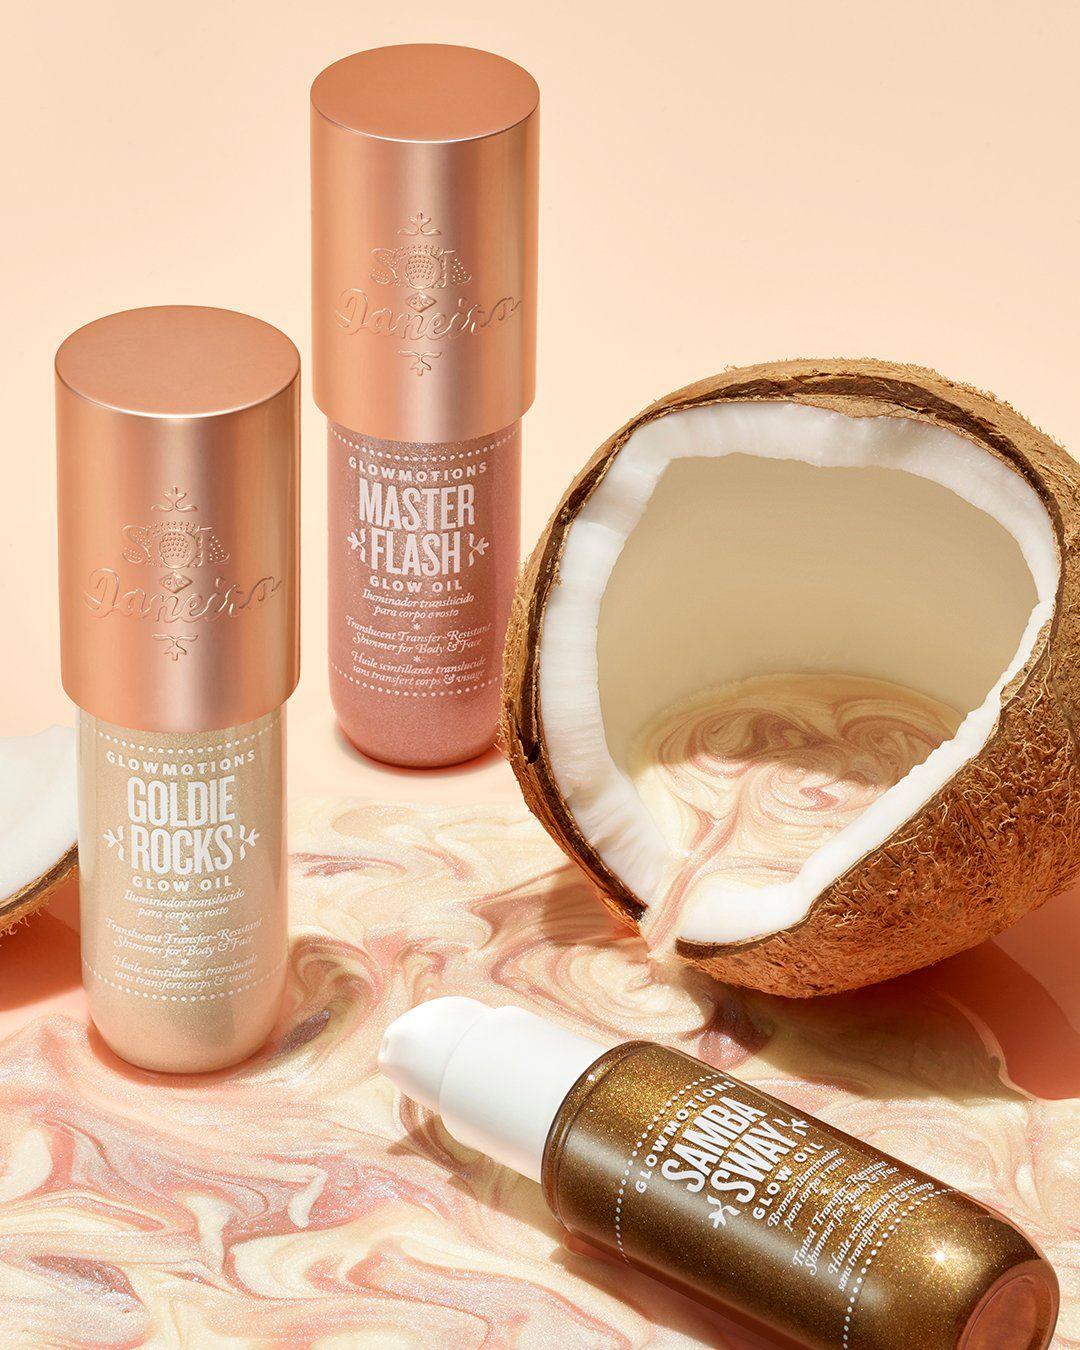 Glowmotions Glow Body Oil Sol De Janeiro Sephora Even Out Skin Tone Anti Aging Beauty Secrets Sephora